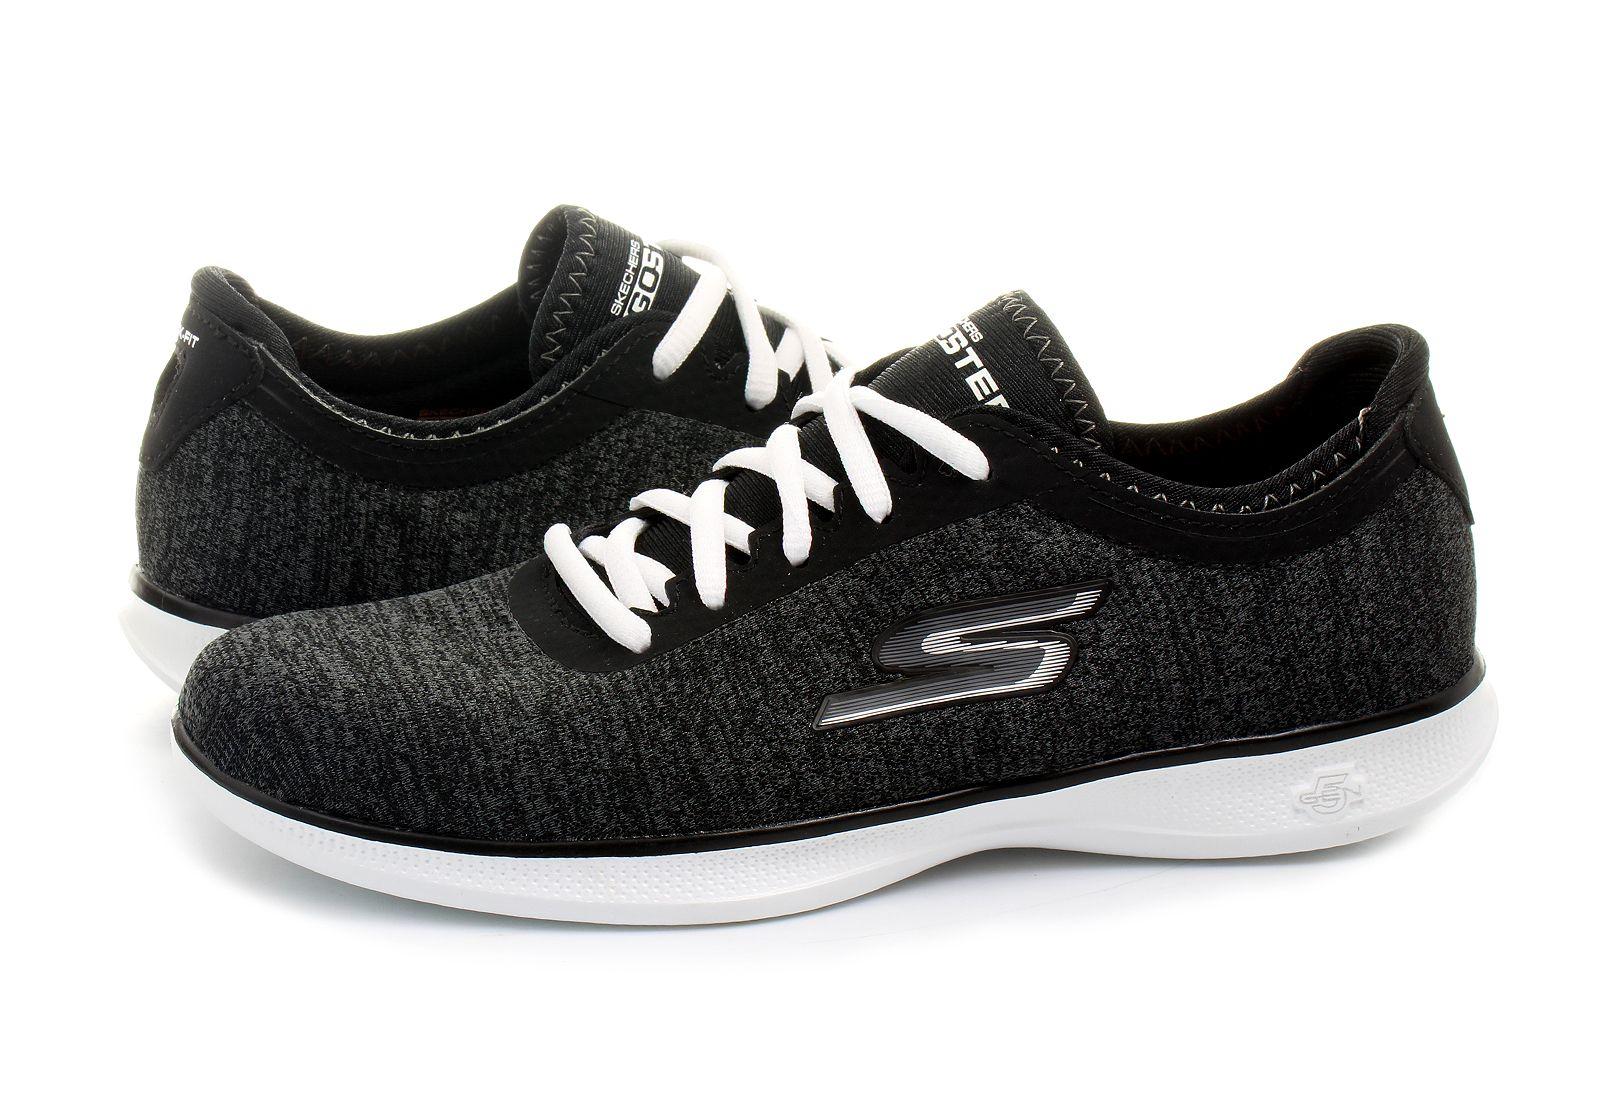 Skechers Womens 14485 Black/White Running Shoes Size 8.5 (296830)